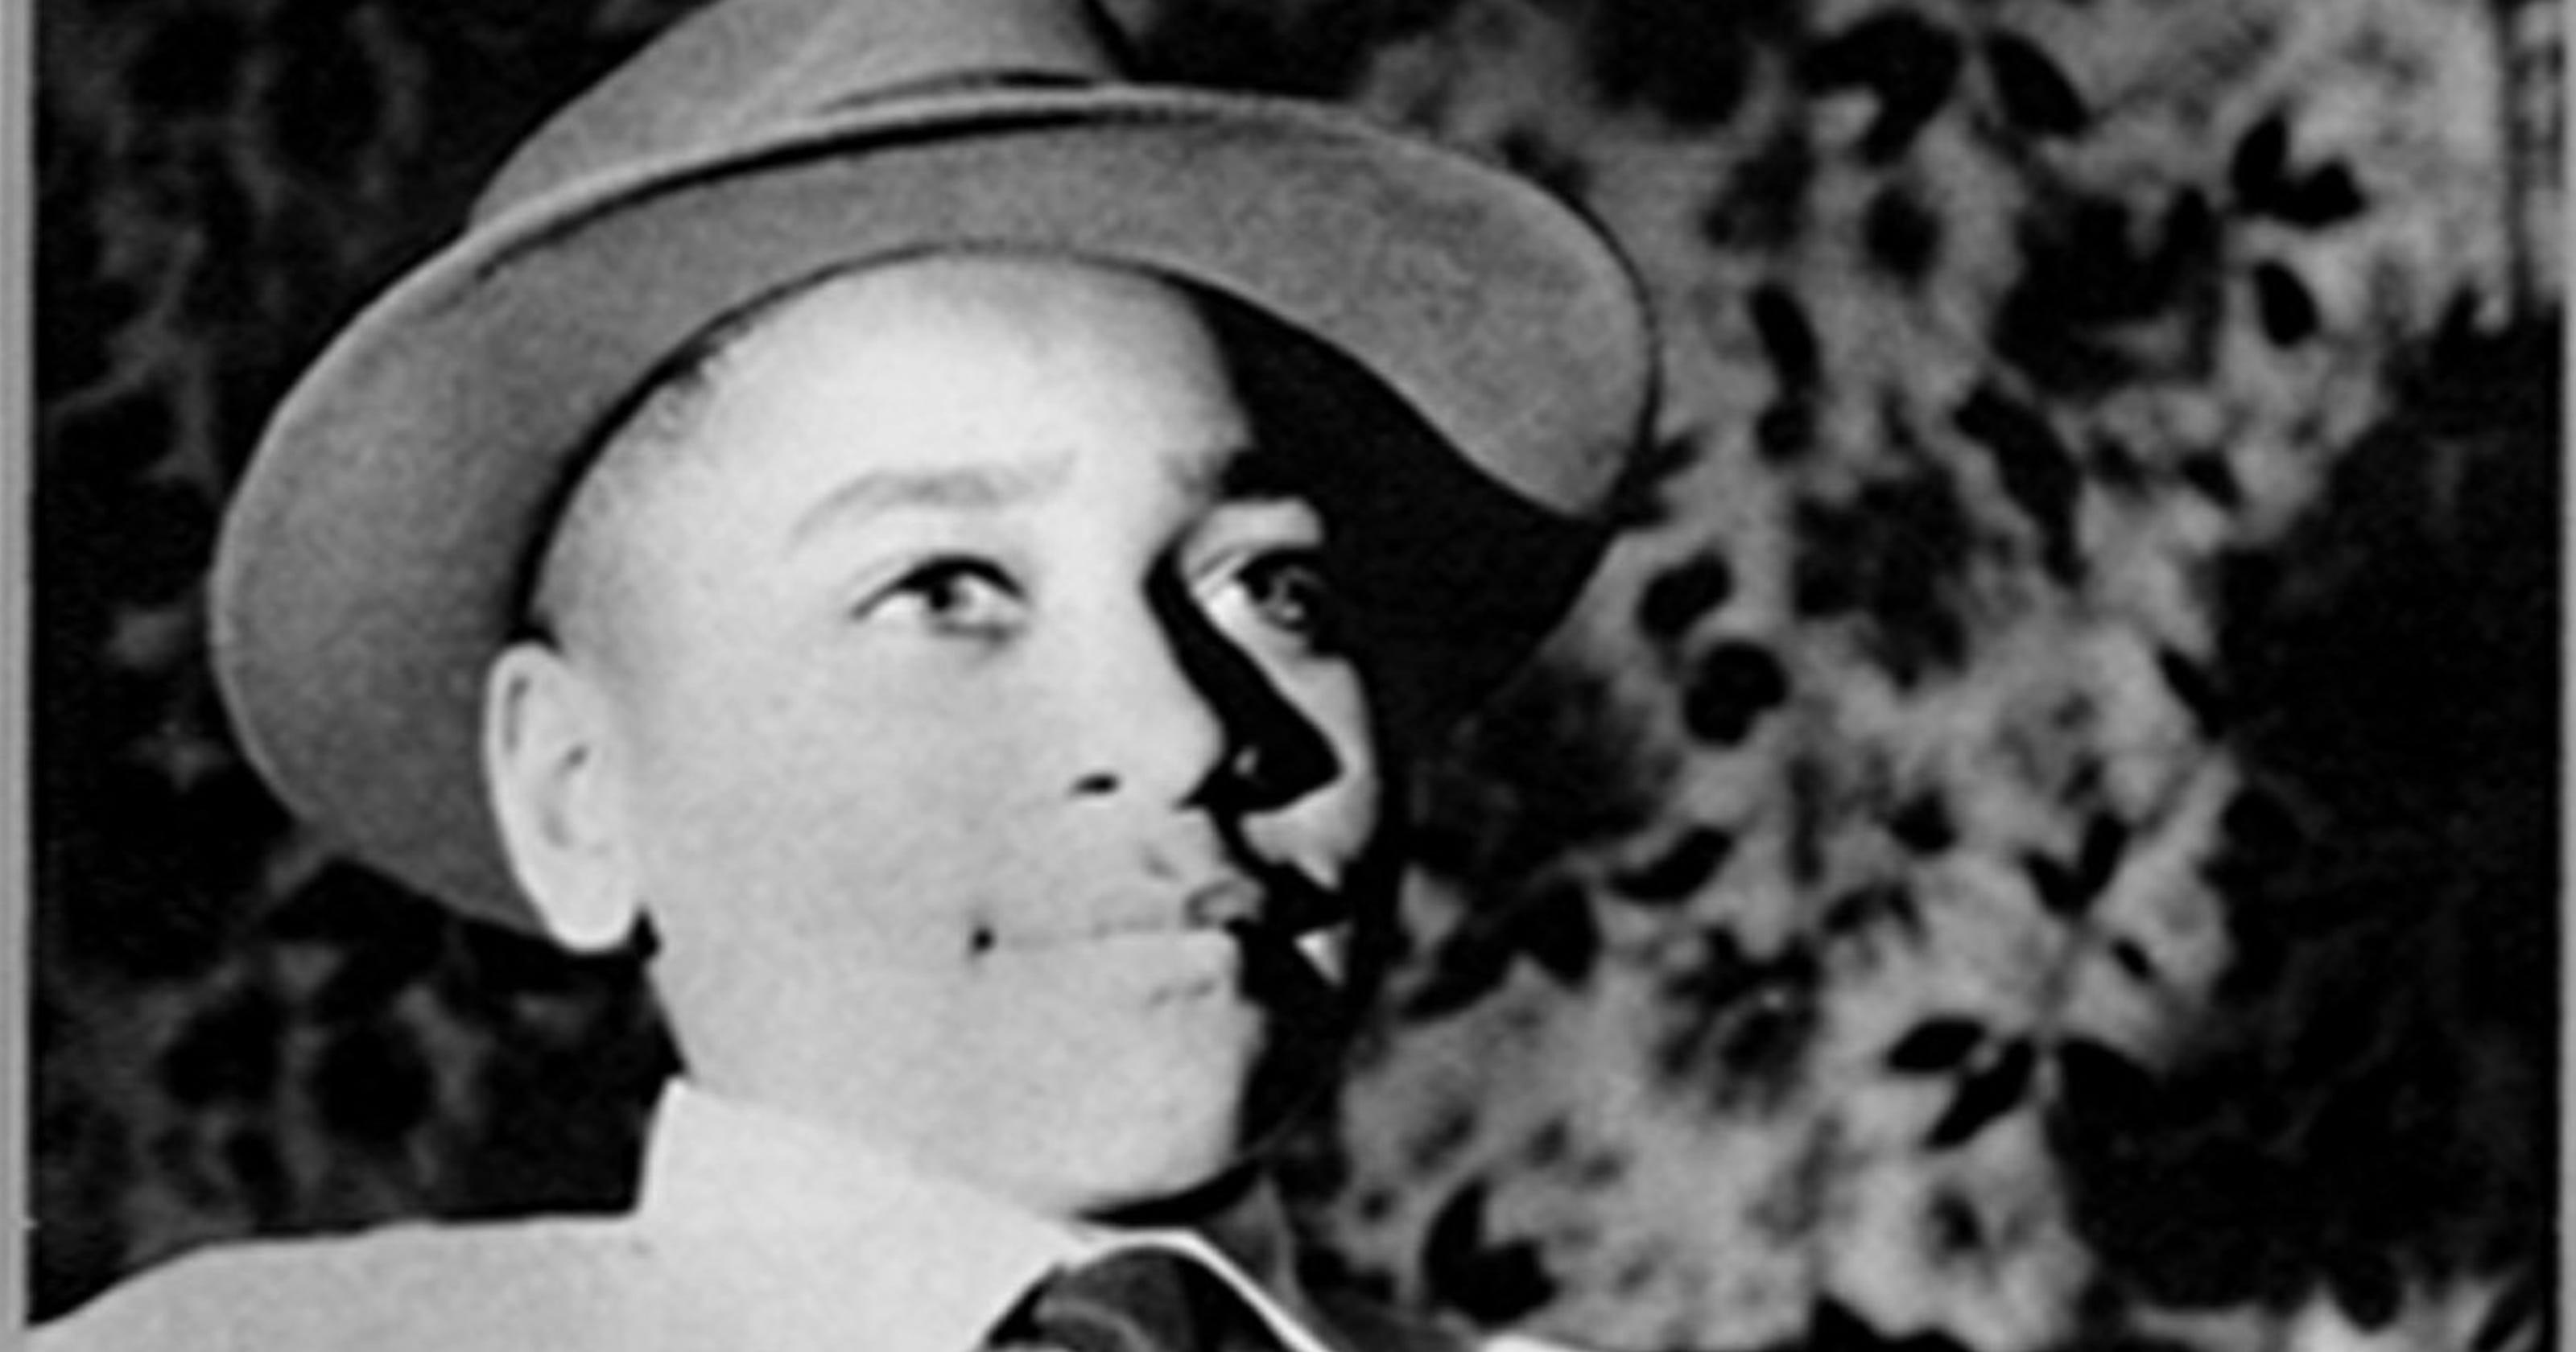 widow of emmett till killer dies quietly notoriously